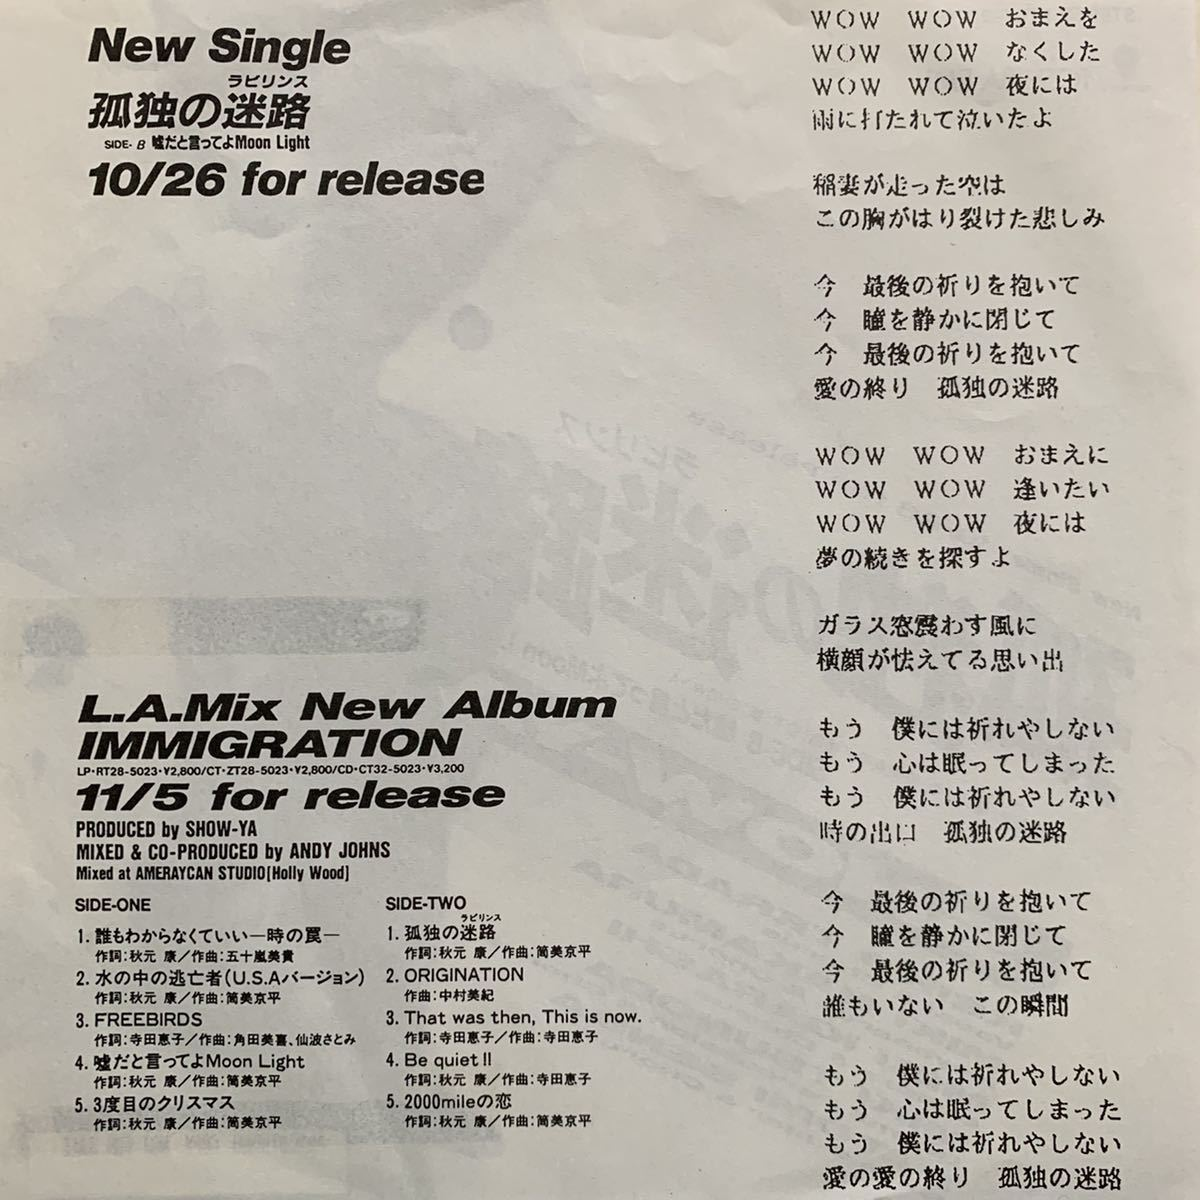 【EP】【7インチレコード】激レア 非売品 見本盤 プロモオンリー SHOW-YA / 孤独の迷路 CD移行期_画像2